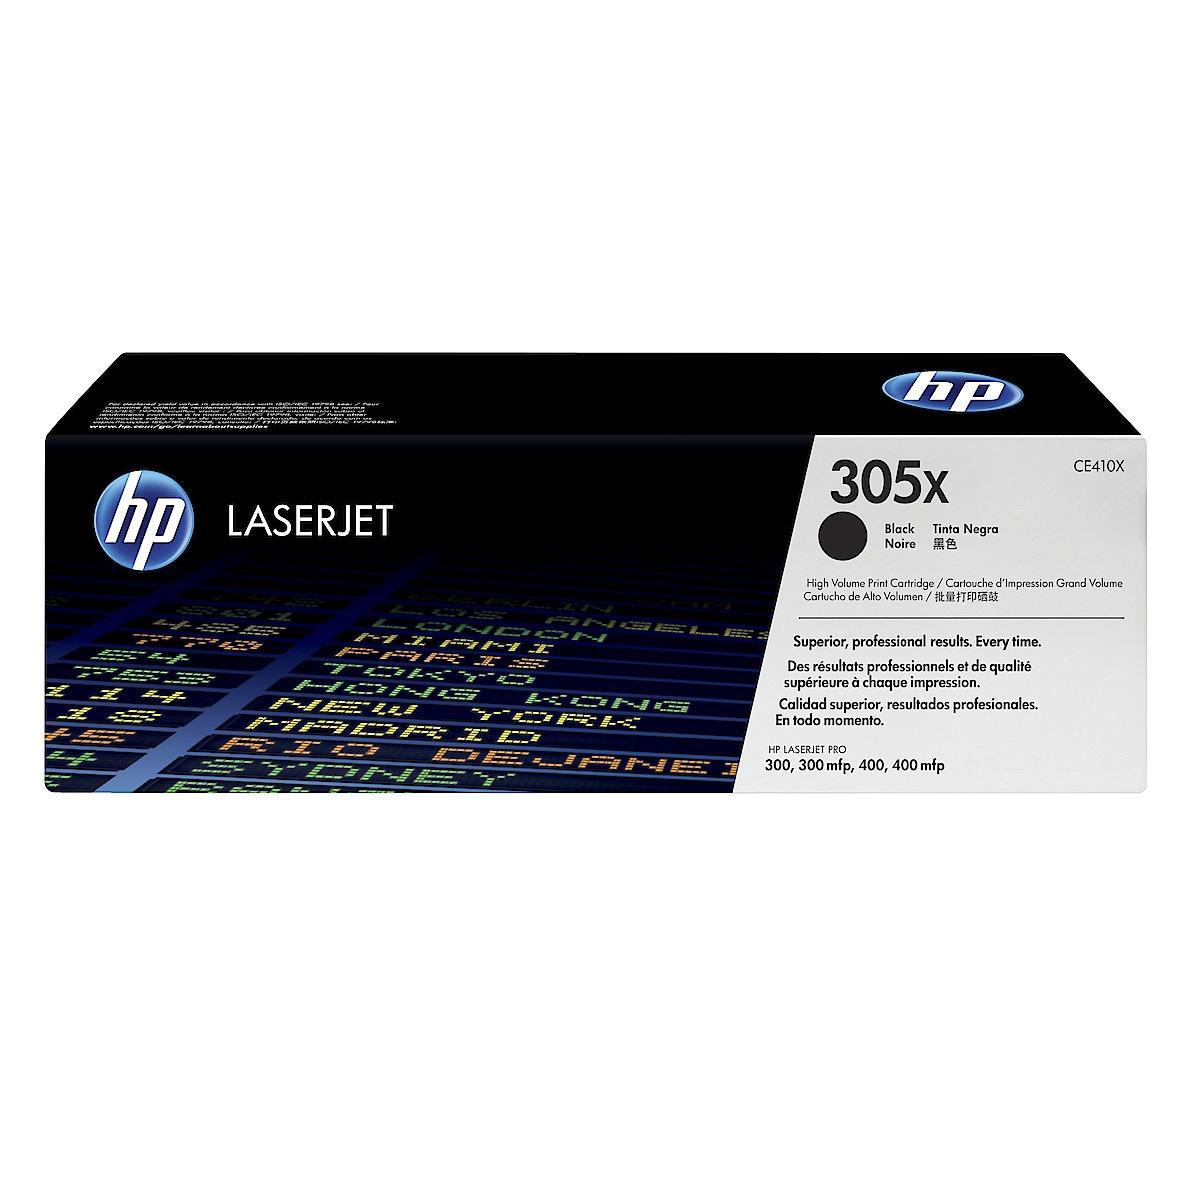 Värikasetti HP 305A